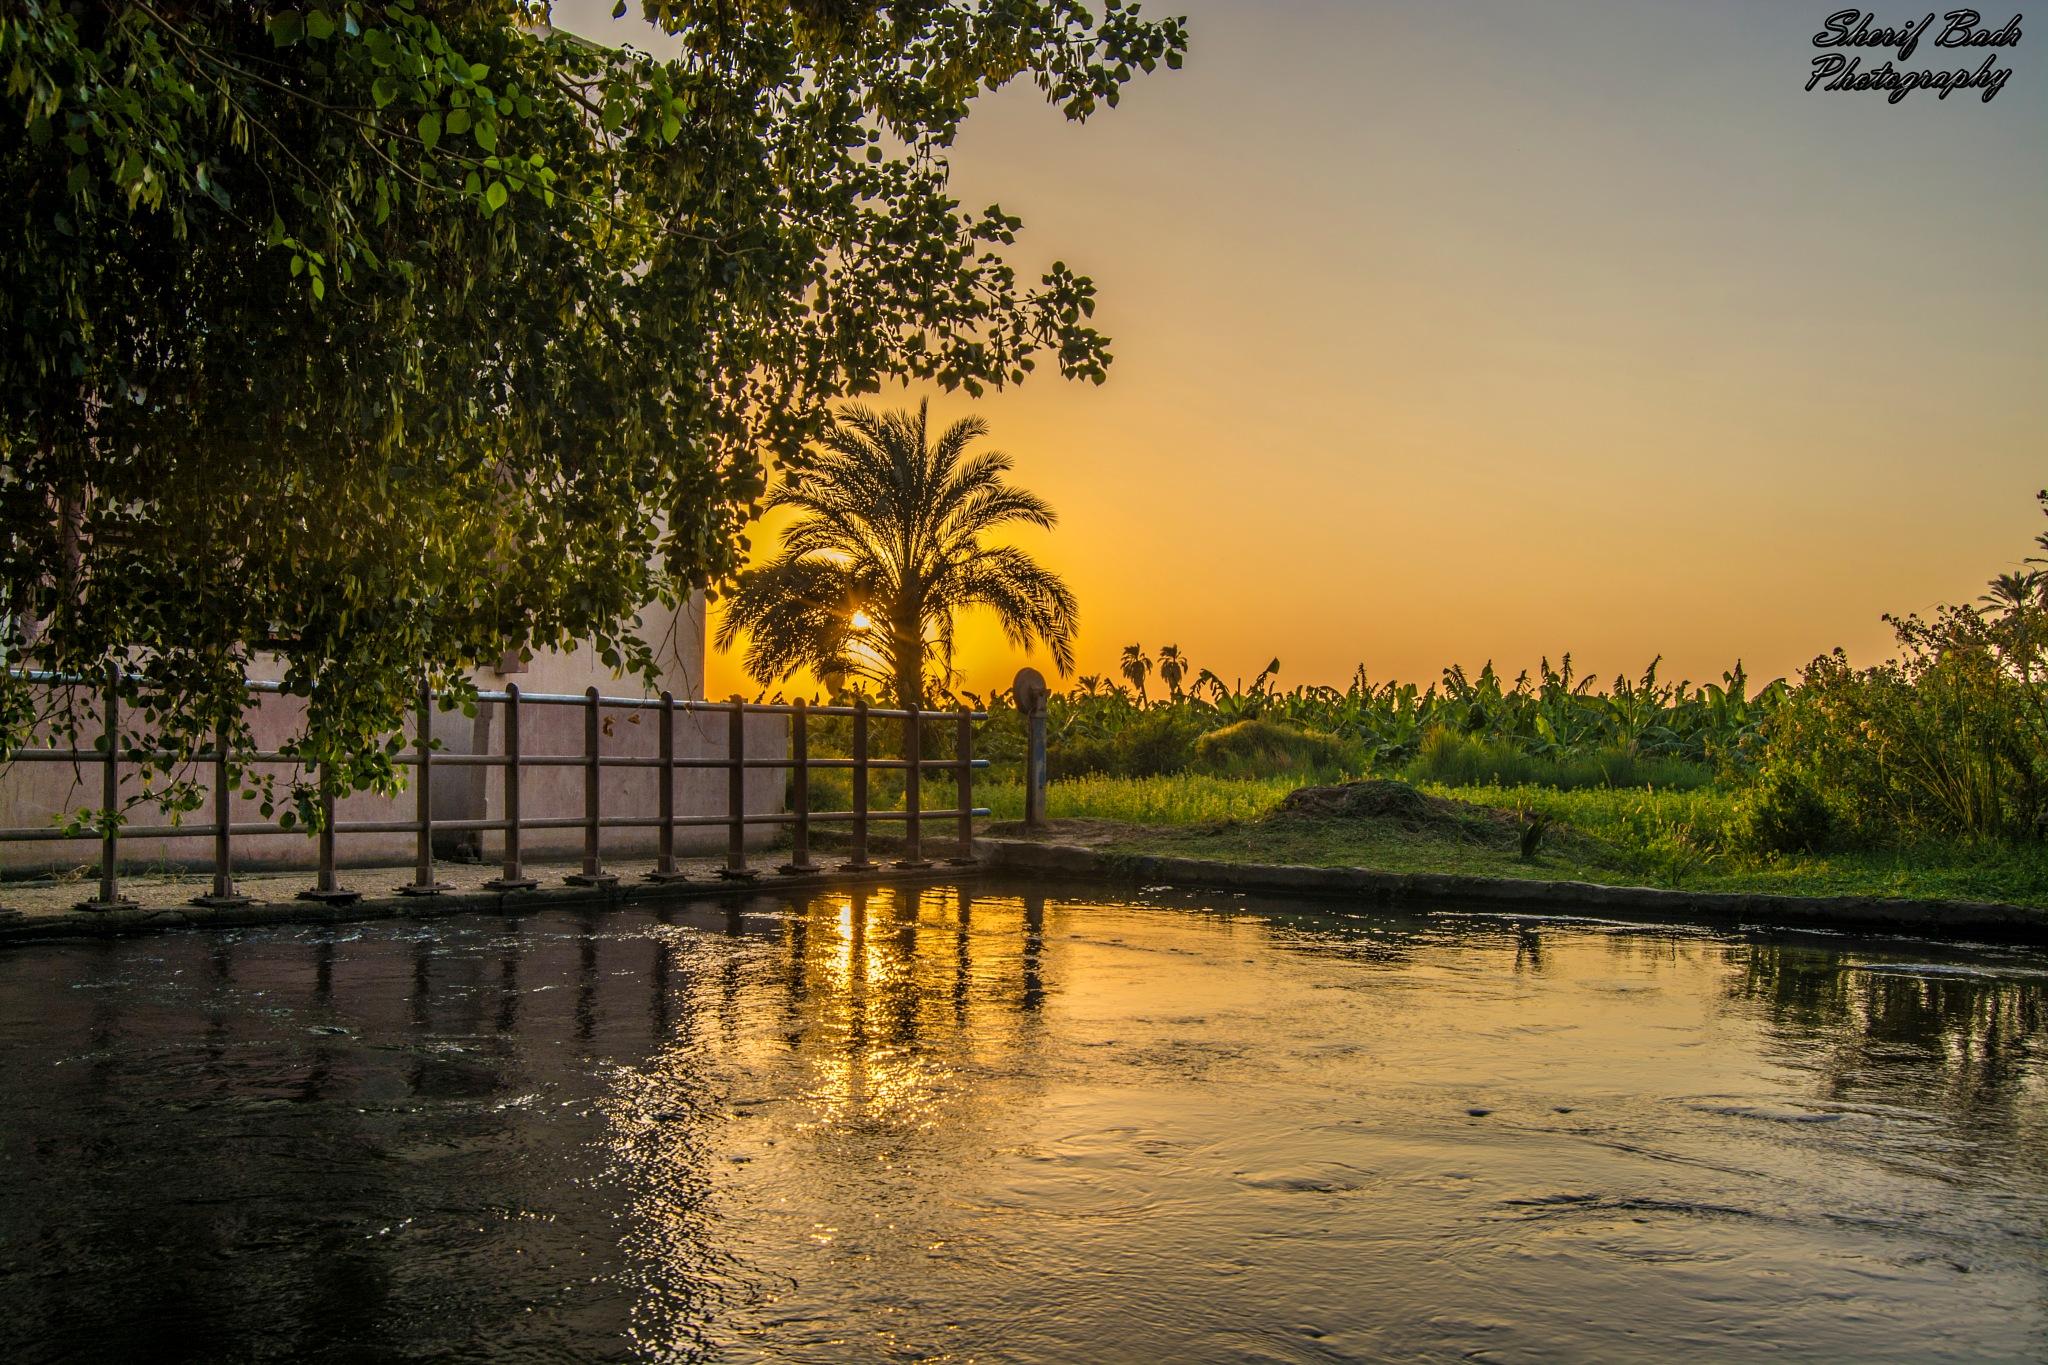 Aswan by Sherif Badr